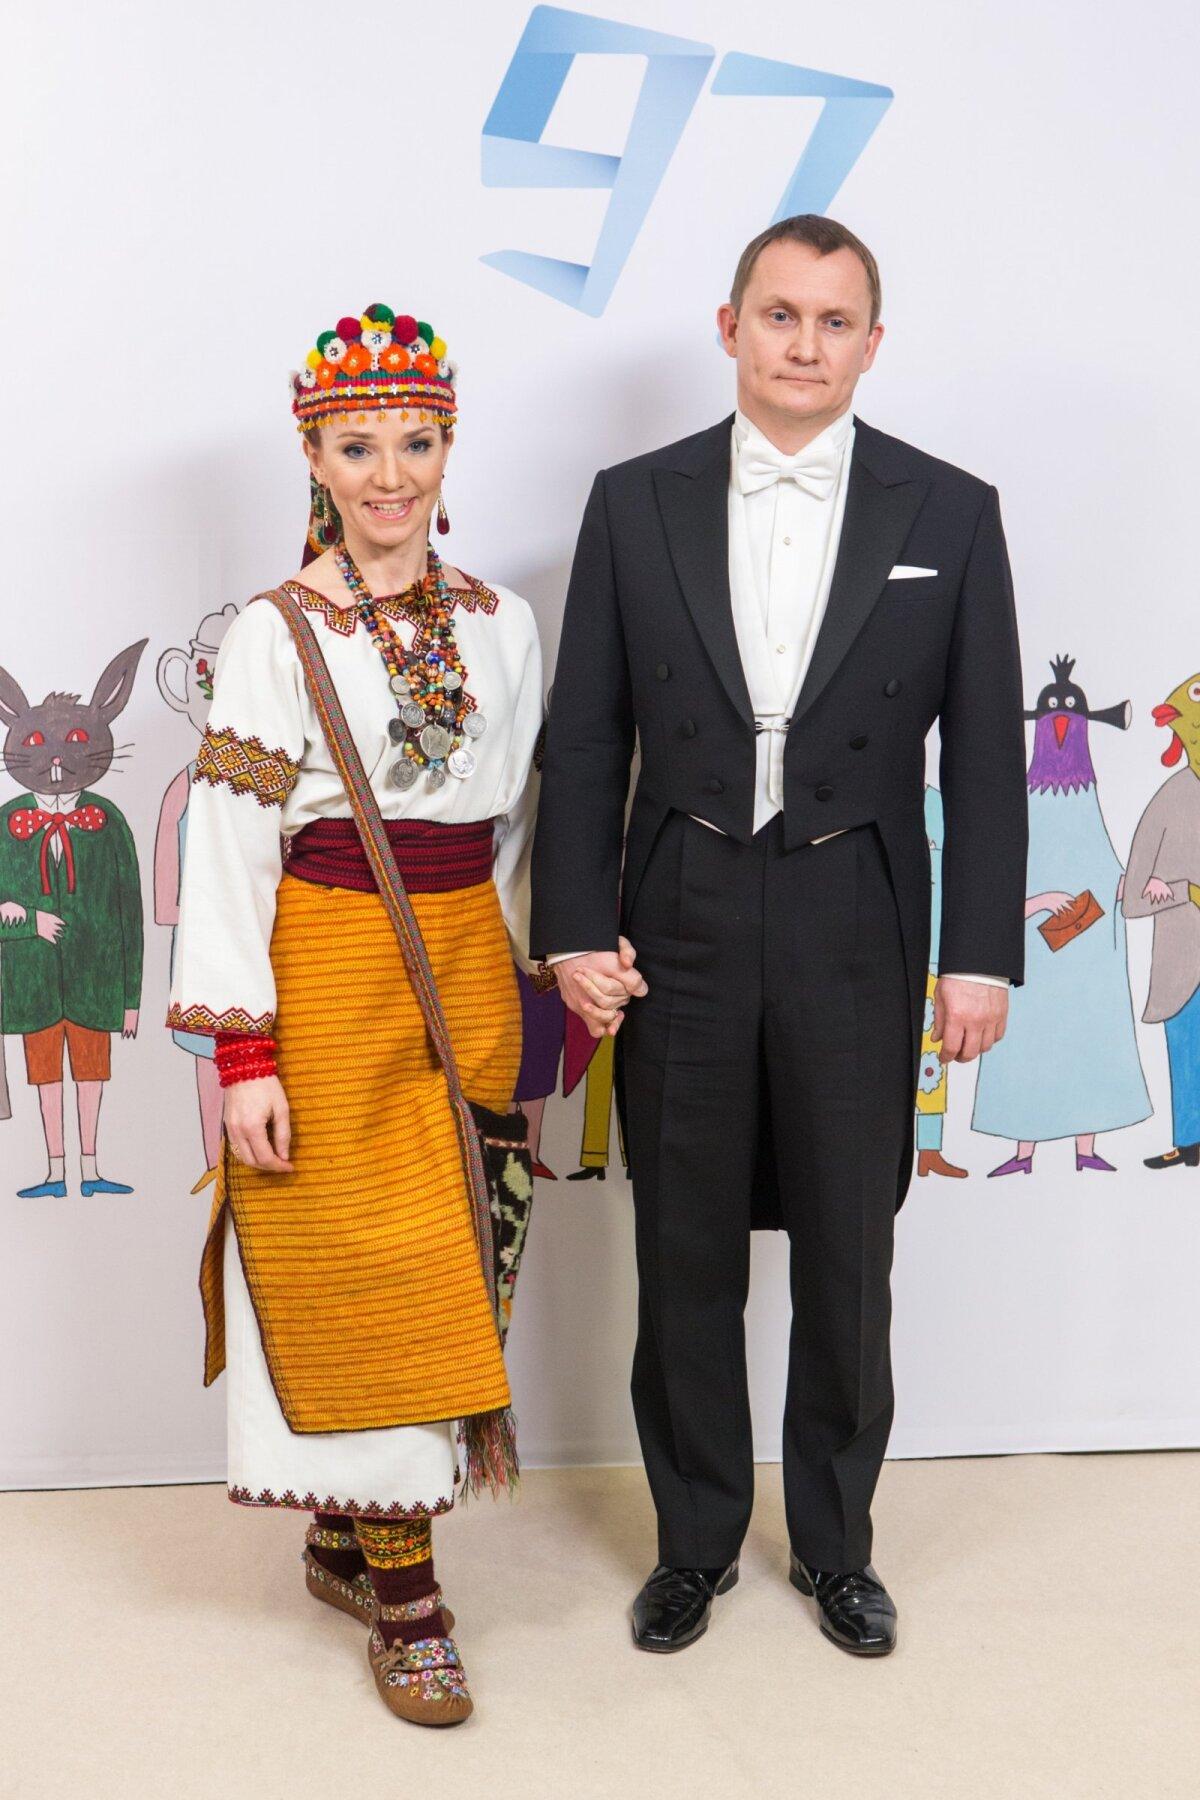 Välisminister Keit Pentus-Rosimannus ja Rain Rosimannus